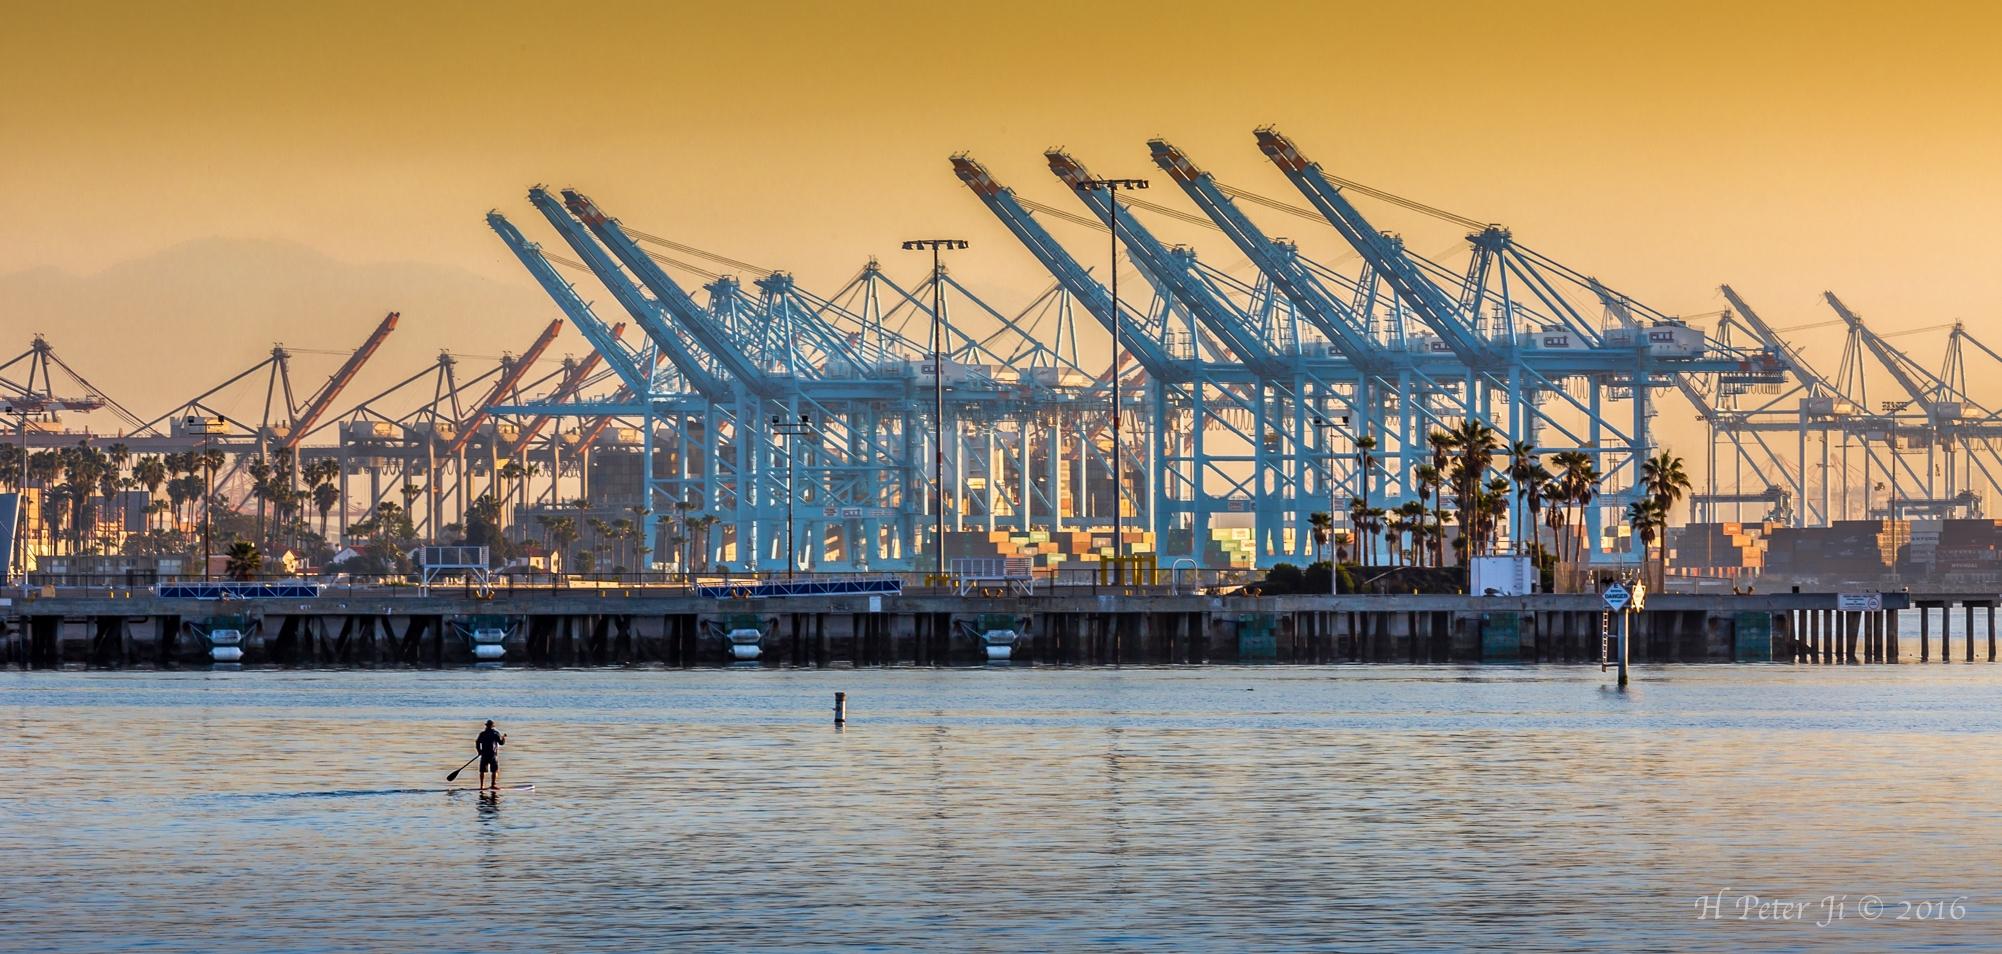 Paddling by Cargo Cranes.jpg